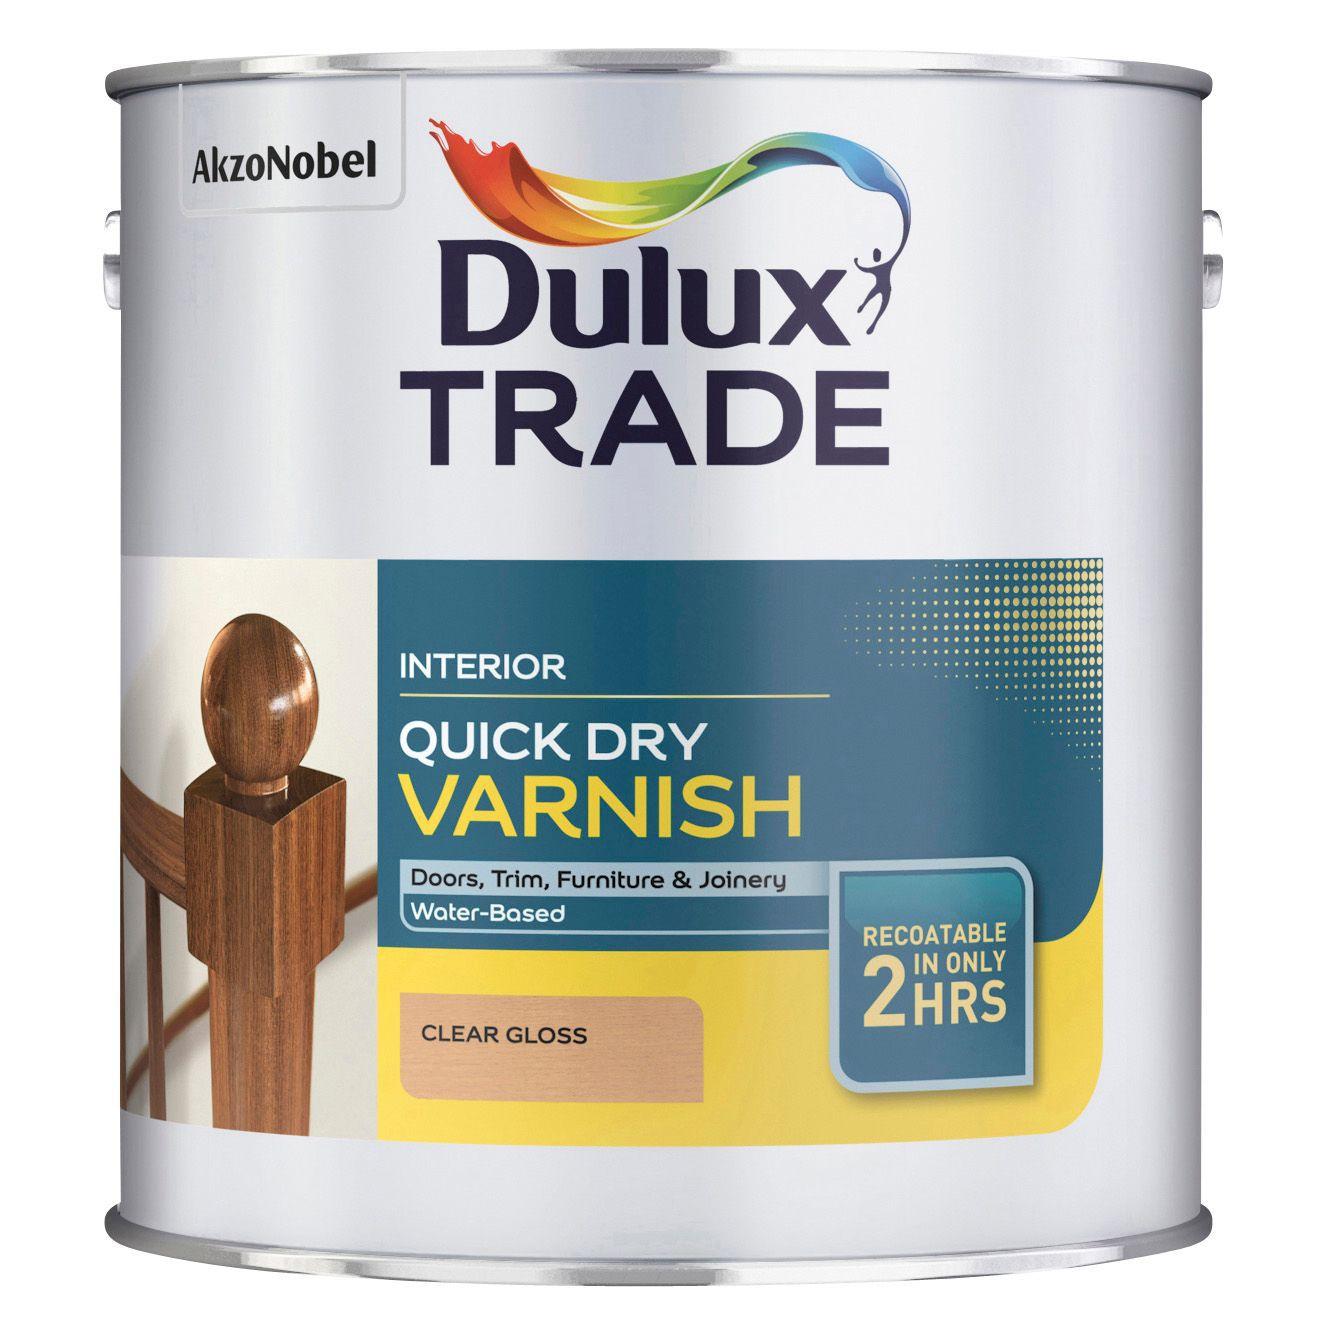 Dulux Trade Clear Gloss Varnish 2500ml